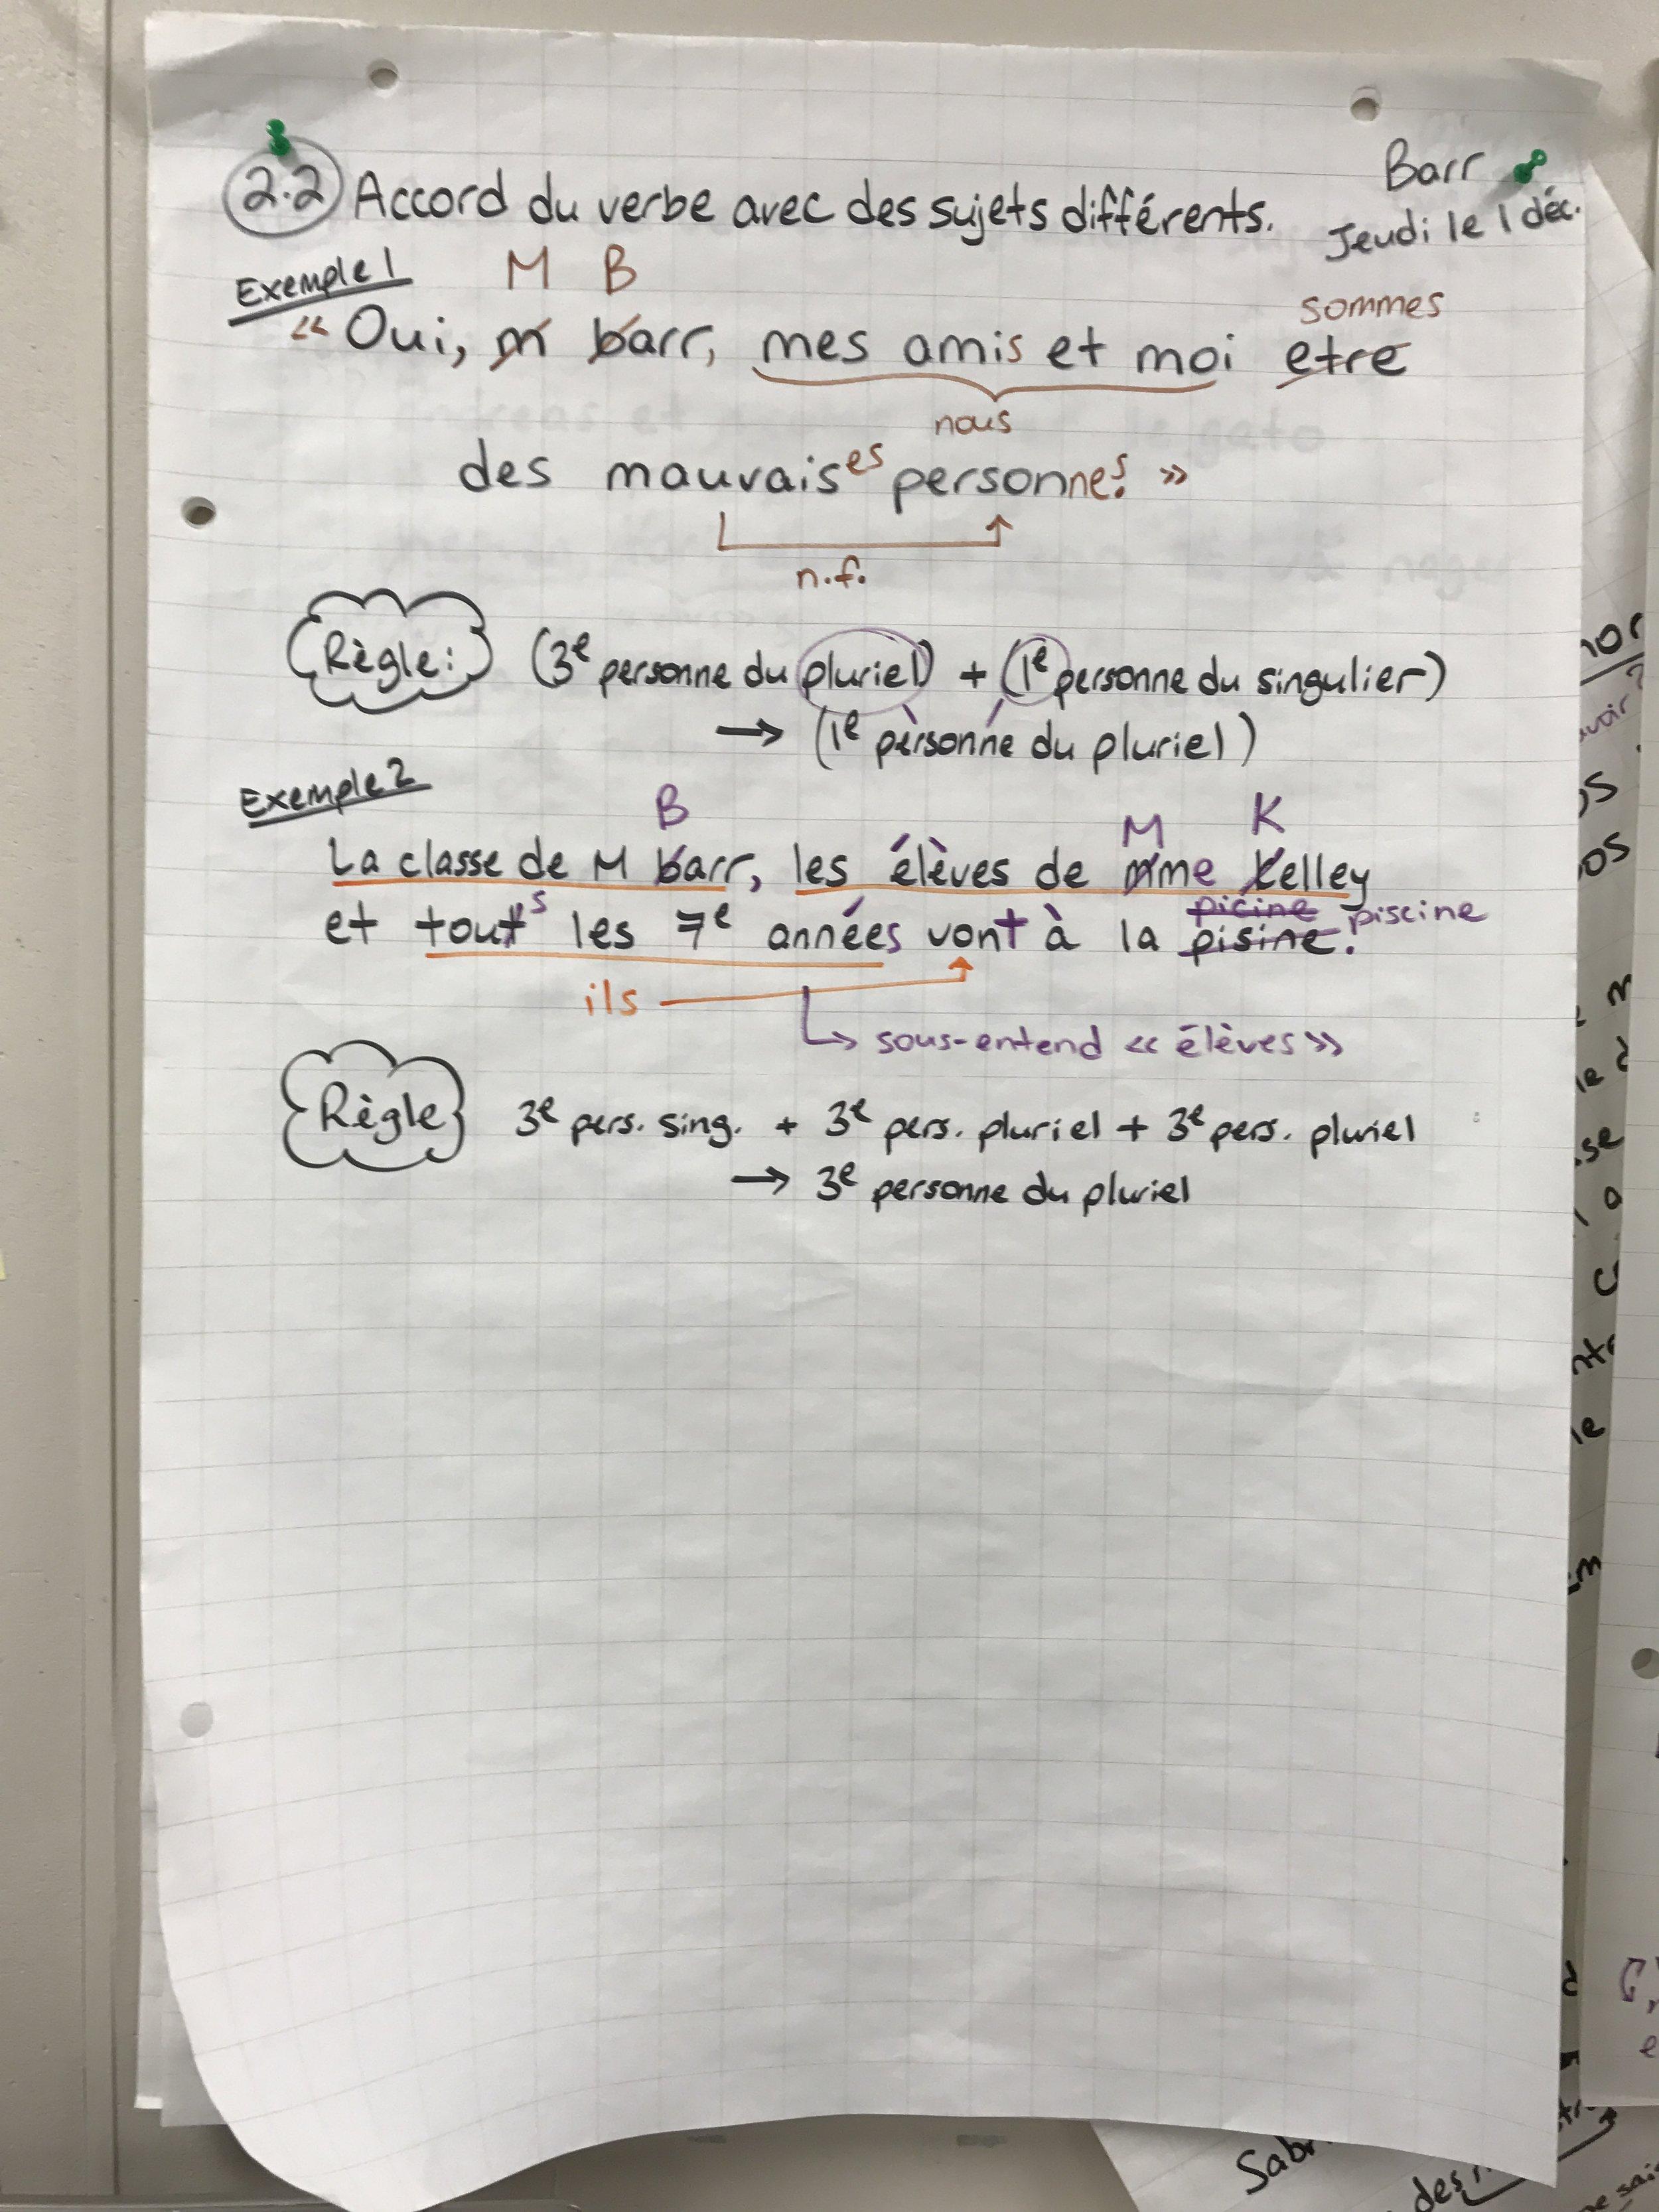 2016-12-01-c3a9tude-linguistique-barr.jpg